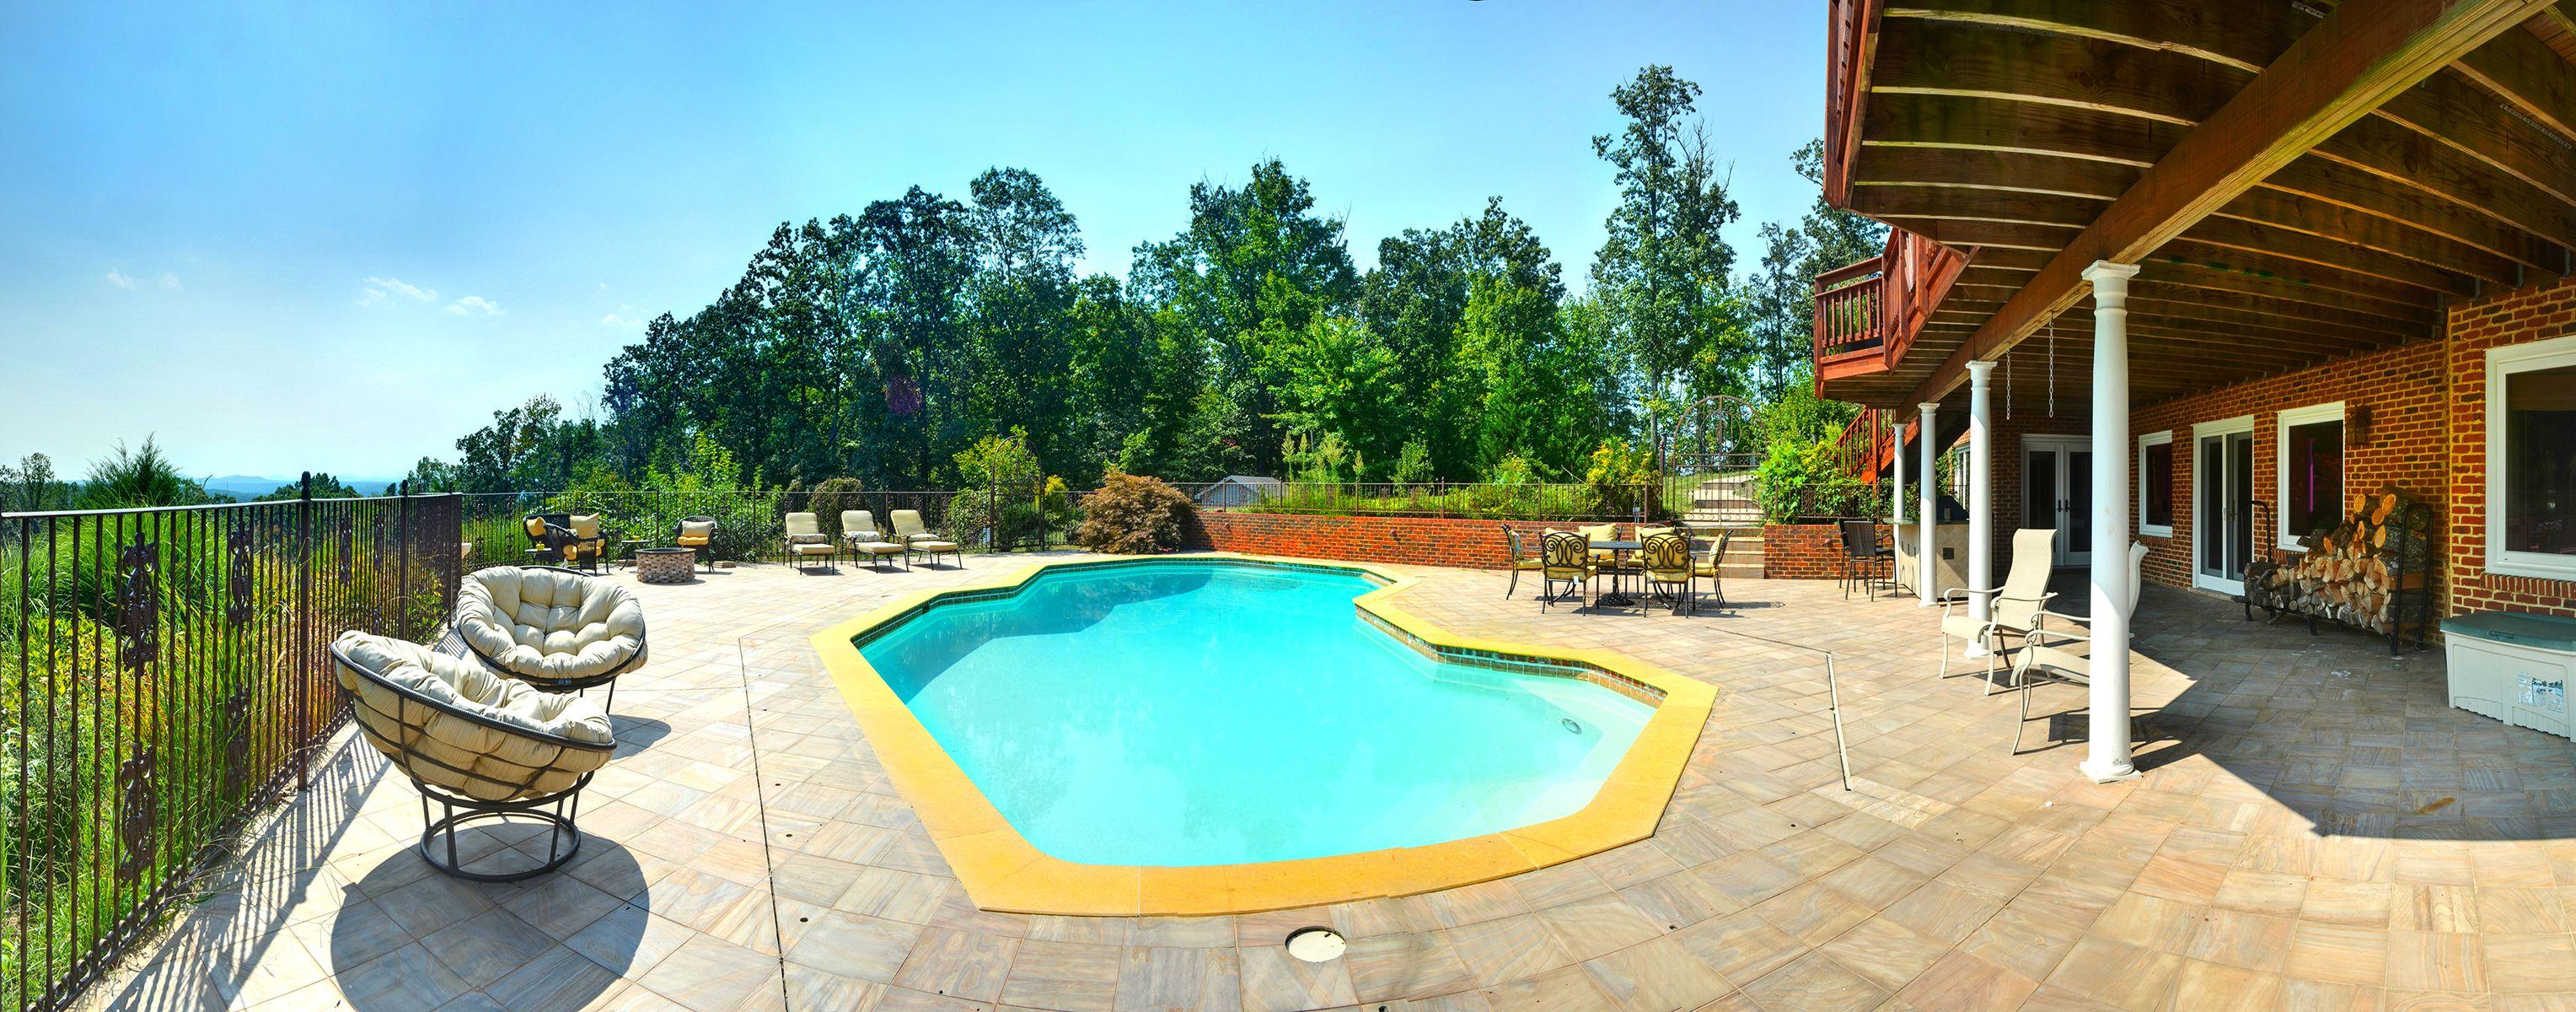 Swimming Pool Swimming Pools Residences Pool